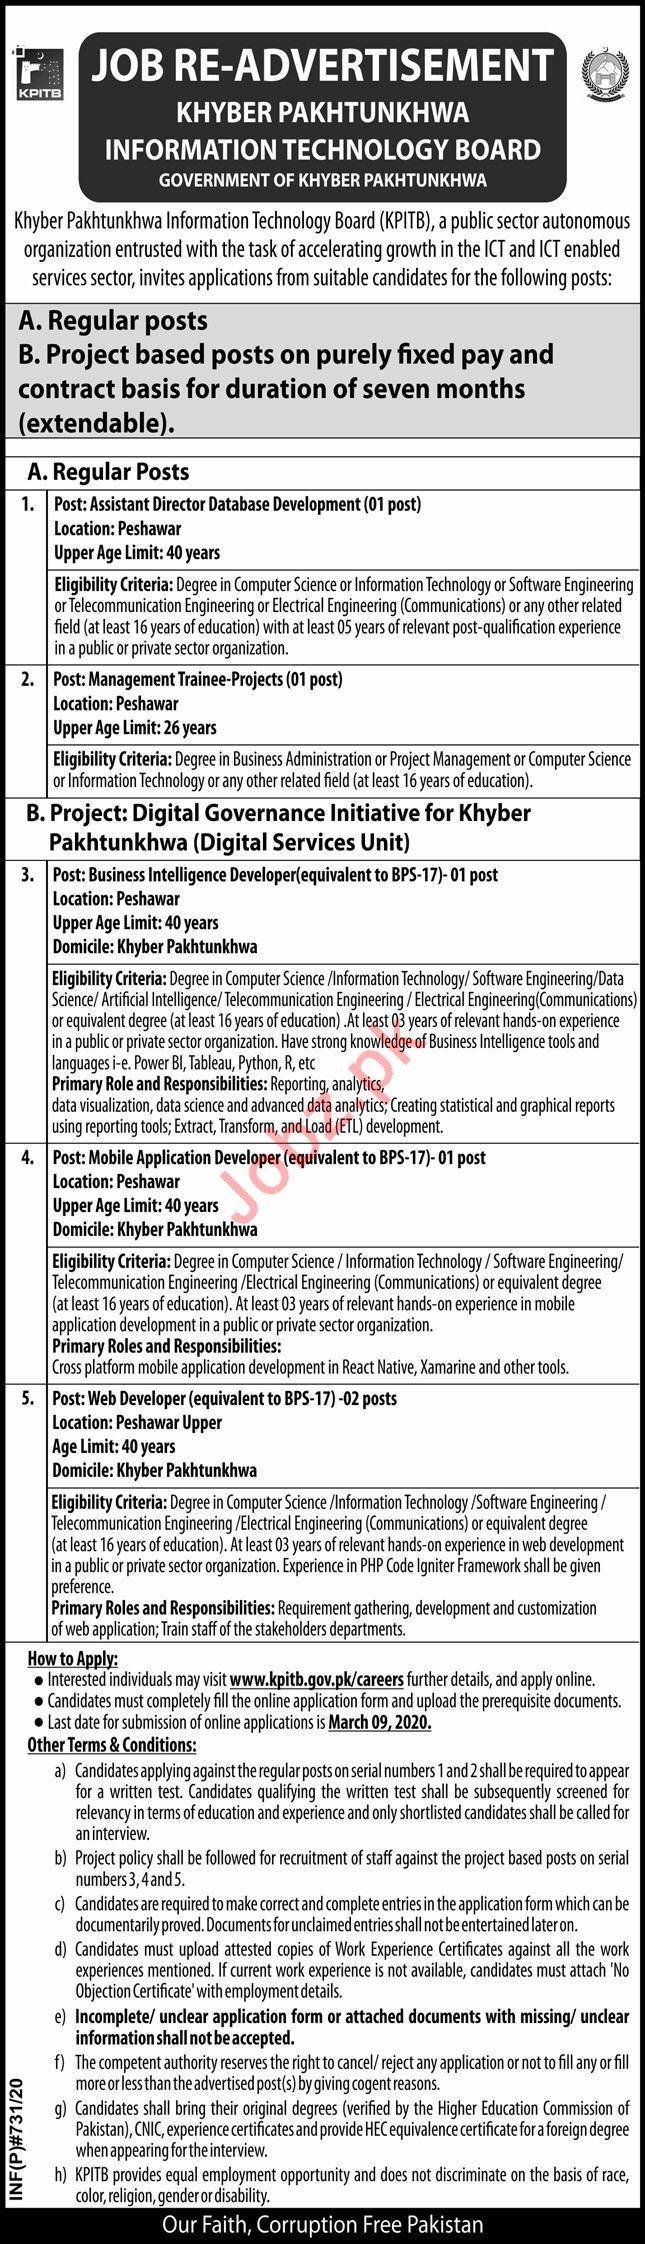 KPITB Management Jobs 2020 in Peshawar